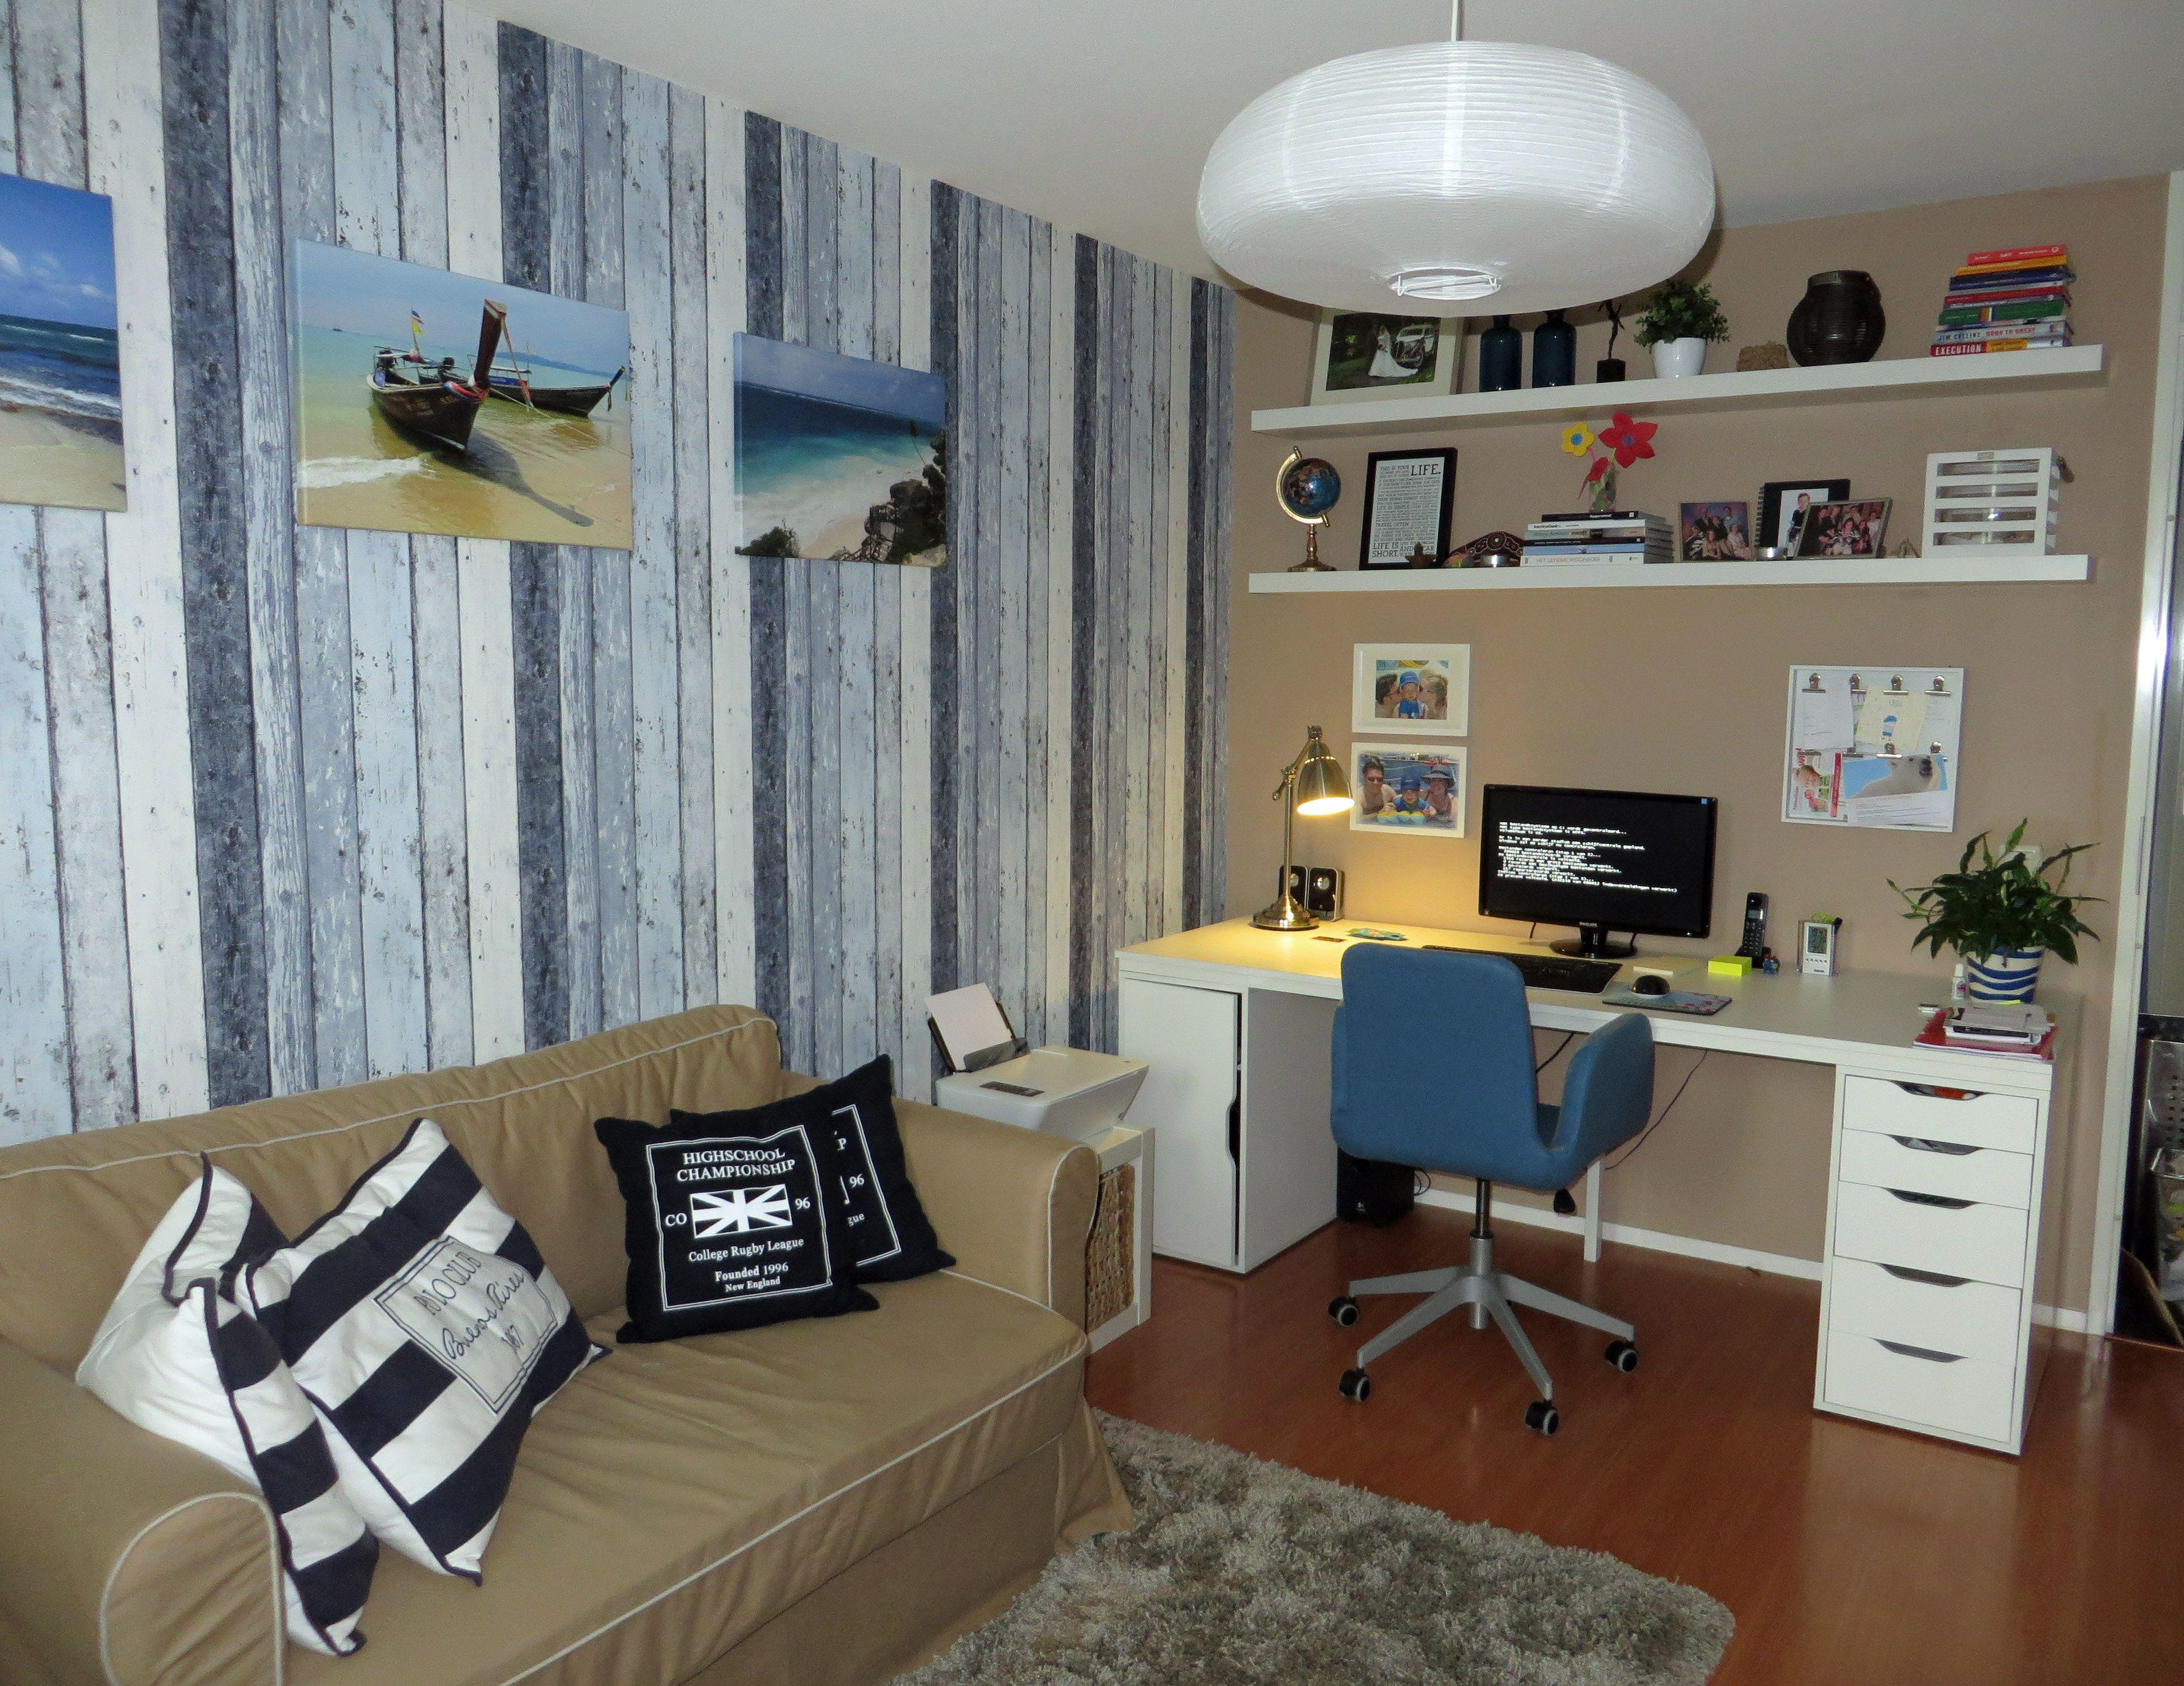 computer logeerkamer met slaapbank met steigerhout behang ikea hagalund slaapbank en alex. Black Bedroom Furniture Sets. Home Design Ideas